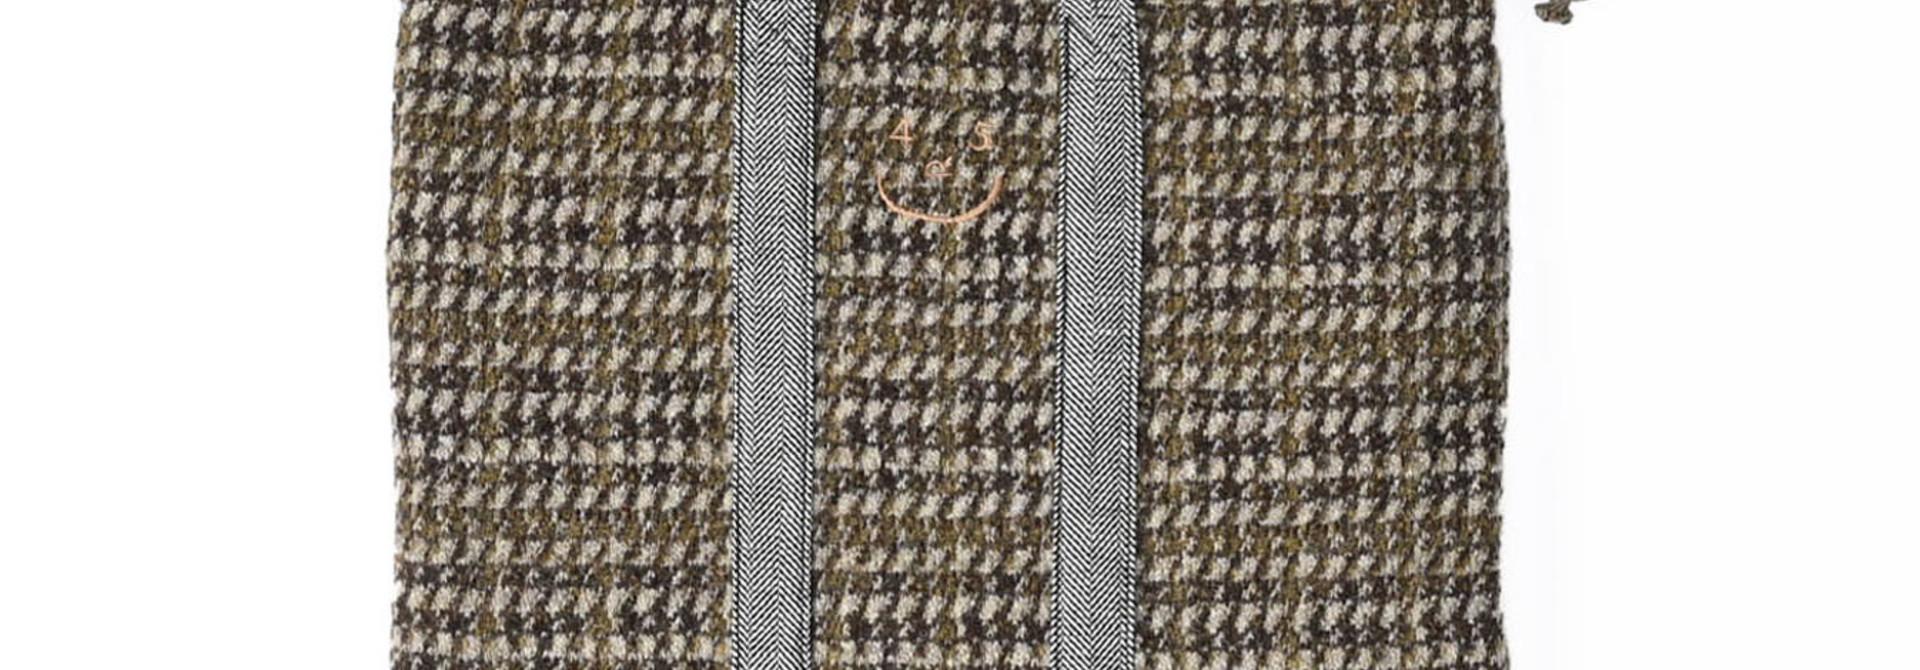 Tweed Knit and Nylon Tote Bag